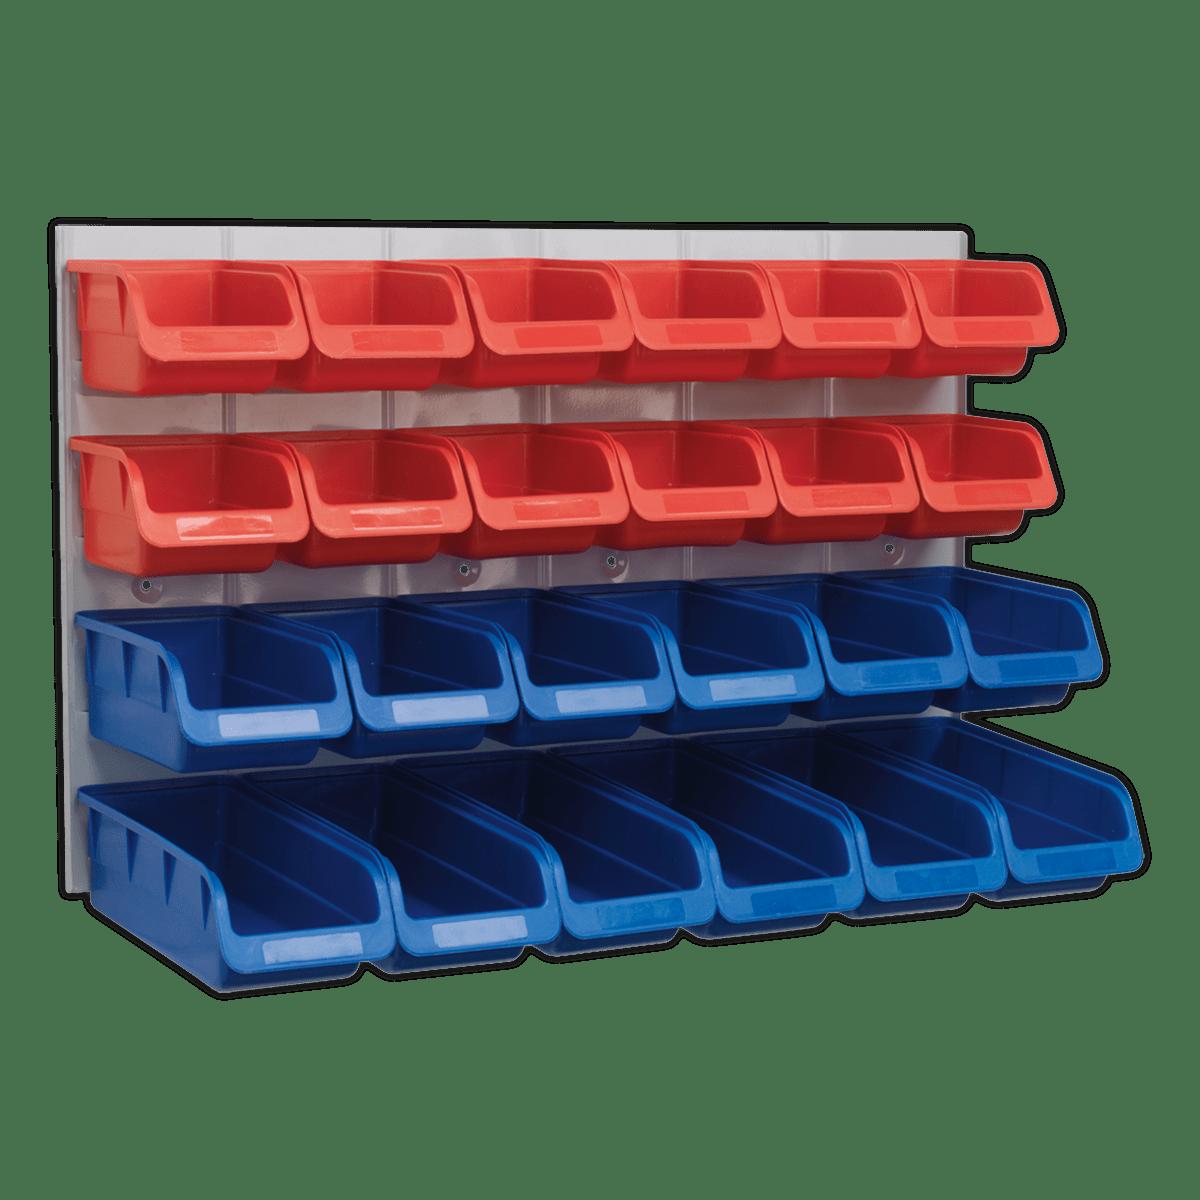 Sealey Bin & Panel Combination 24 Bins - Red/Blue TPS132